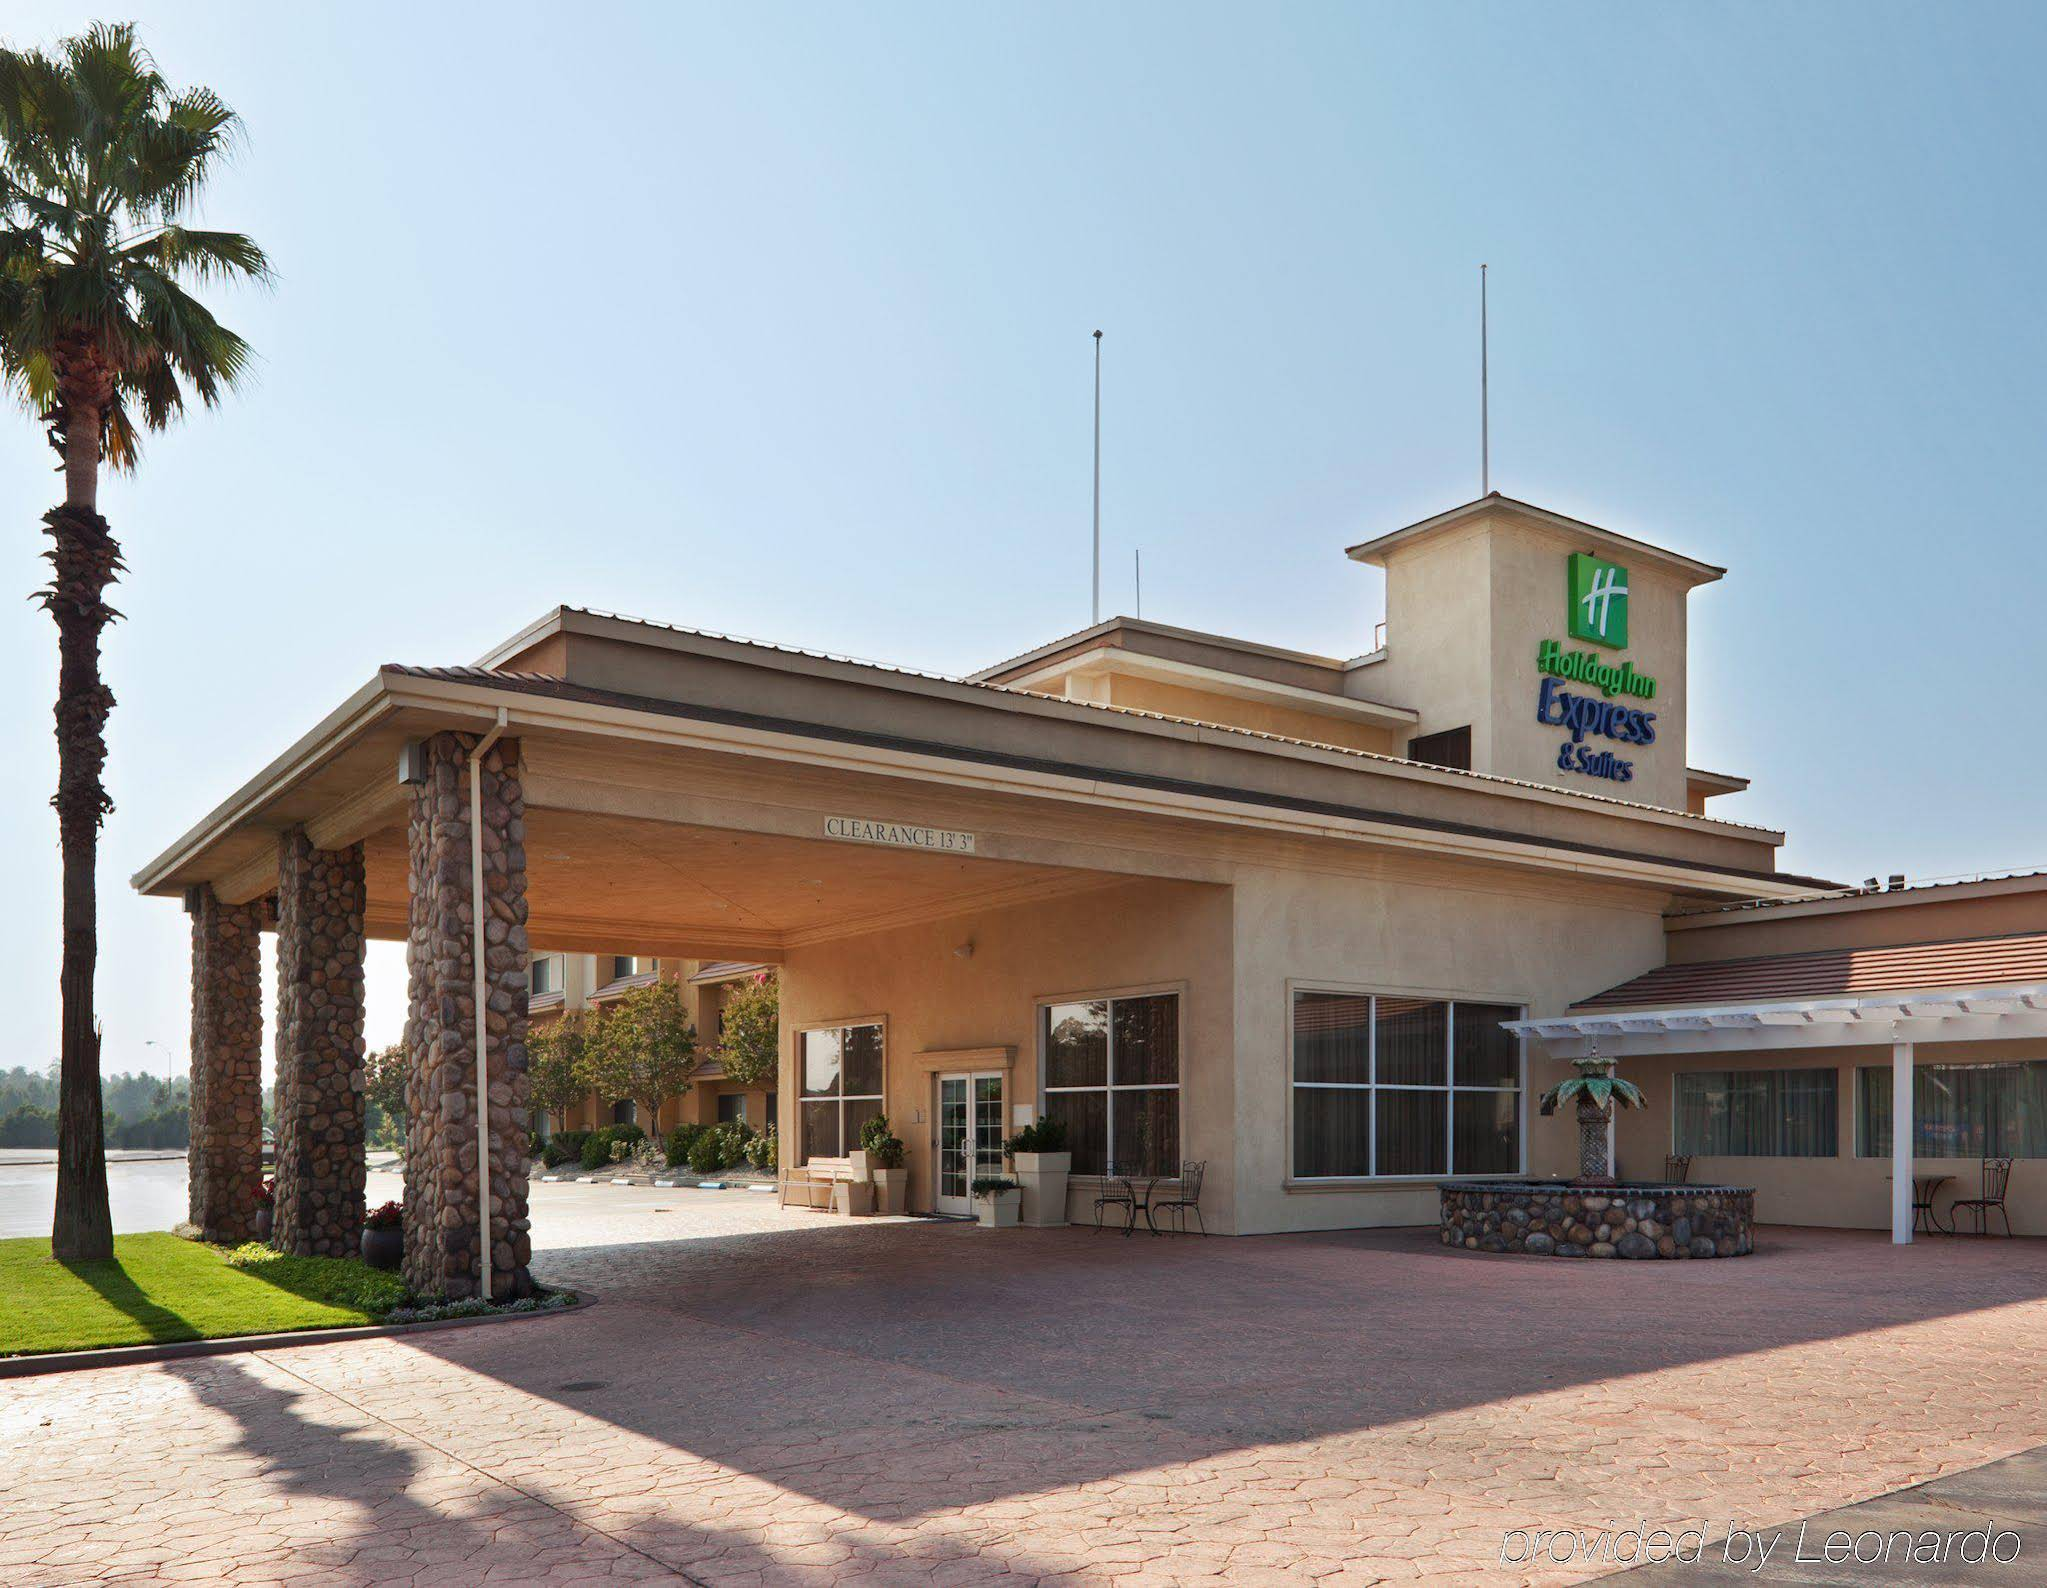 Holiday Inn Express Corning